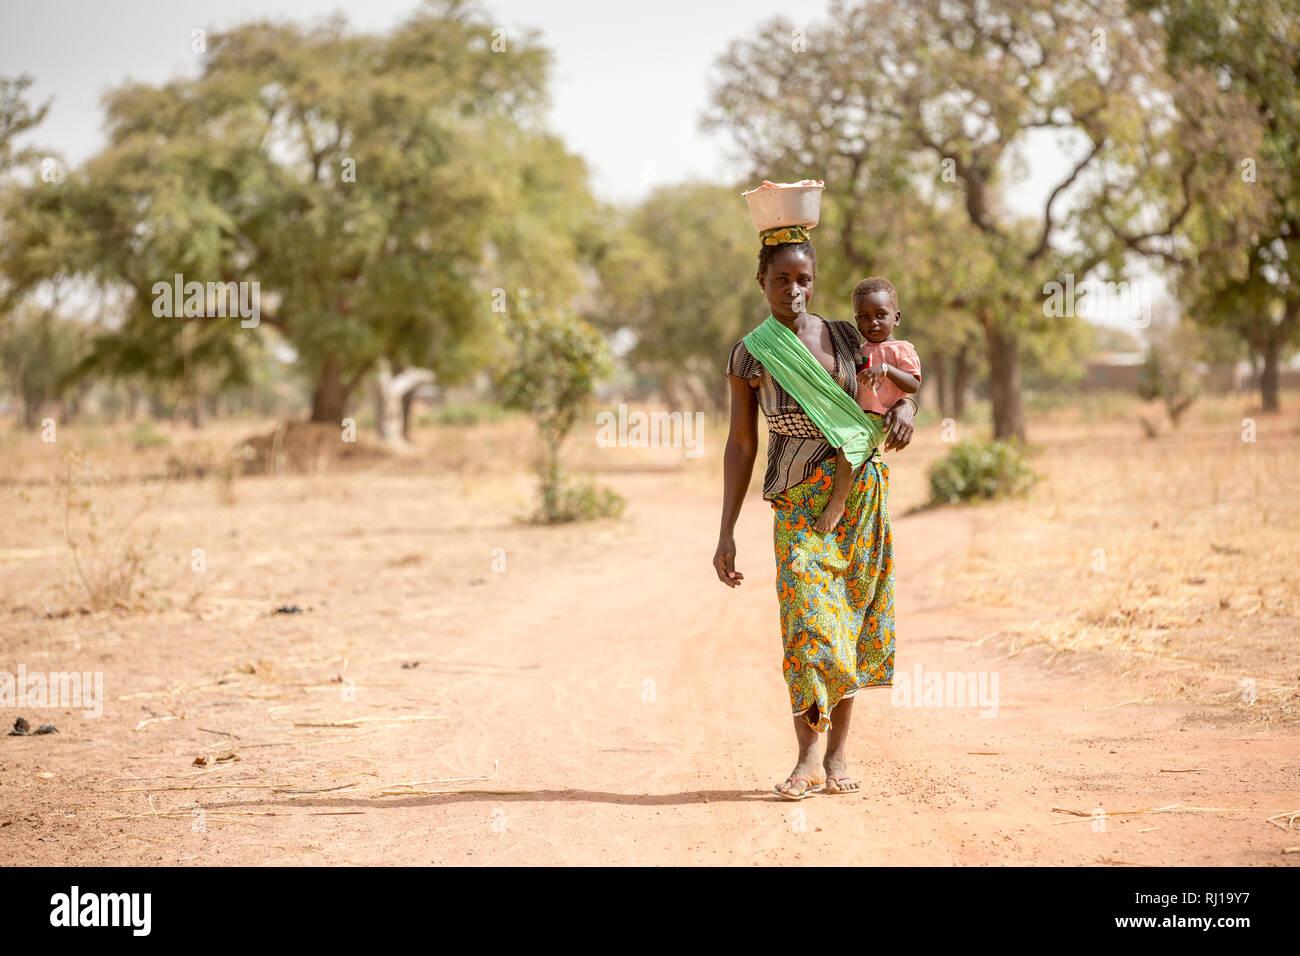 Samba village, Yako Province, Burkina Faso; Sally Zoundi, 35, with her baby Salomon Zoundi, 15 months, on her way to work at the local goldmine to support her family. Stock Photo